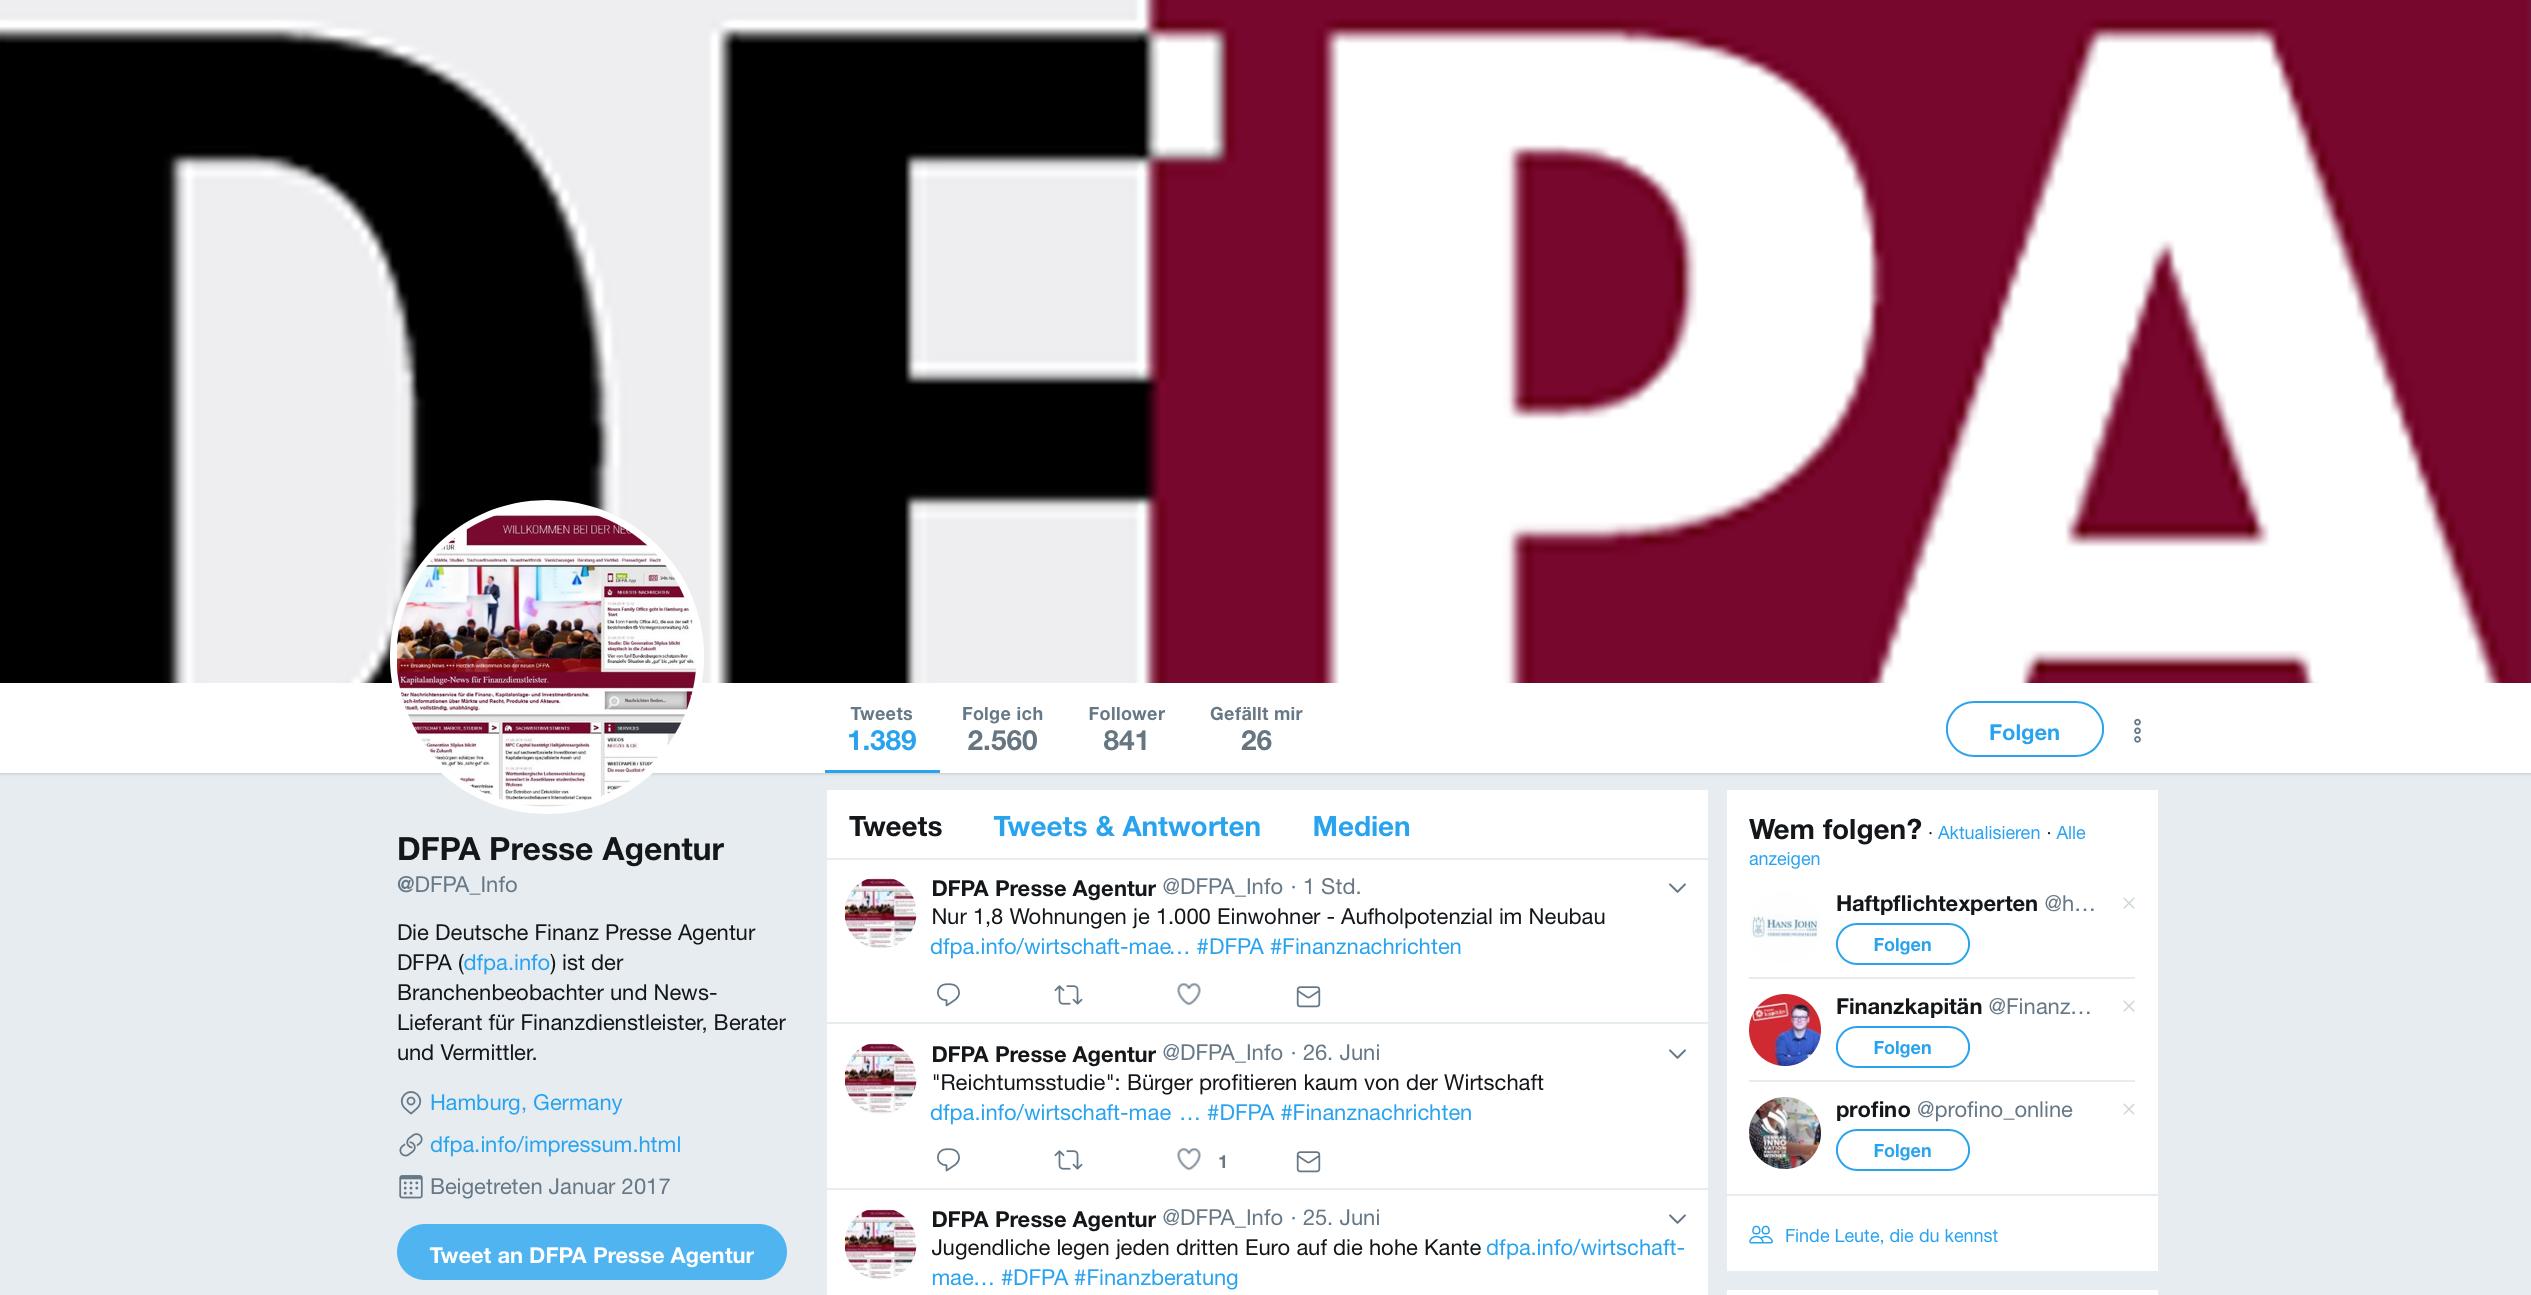 Social Media in der Finanzbranche: DFPA-Twitter Account für Finanzprofis